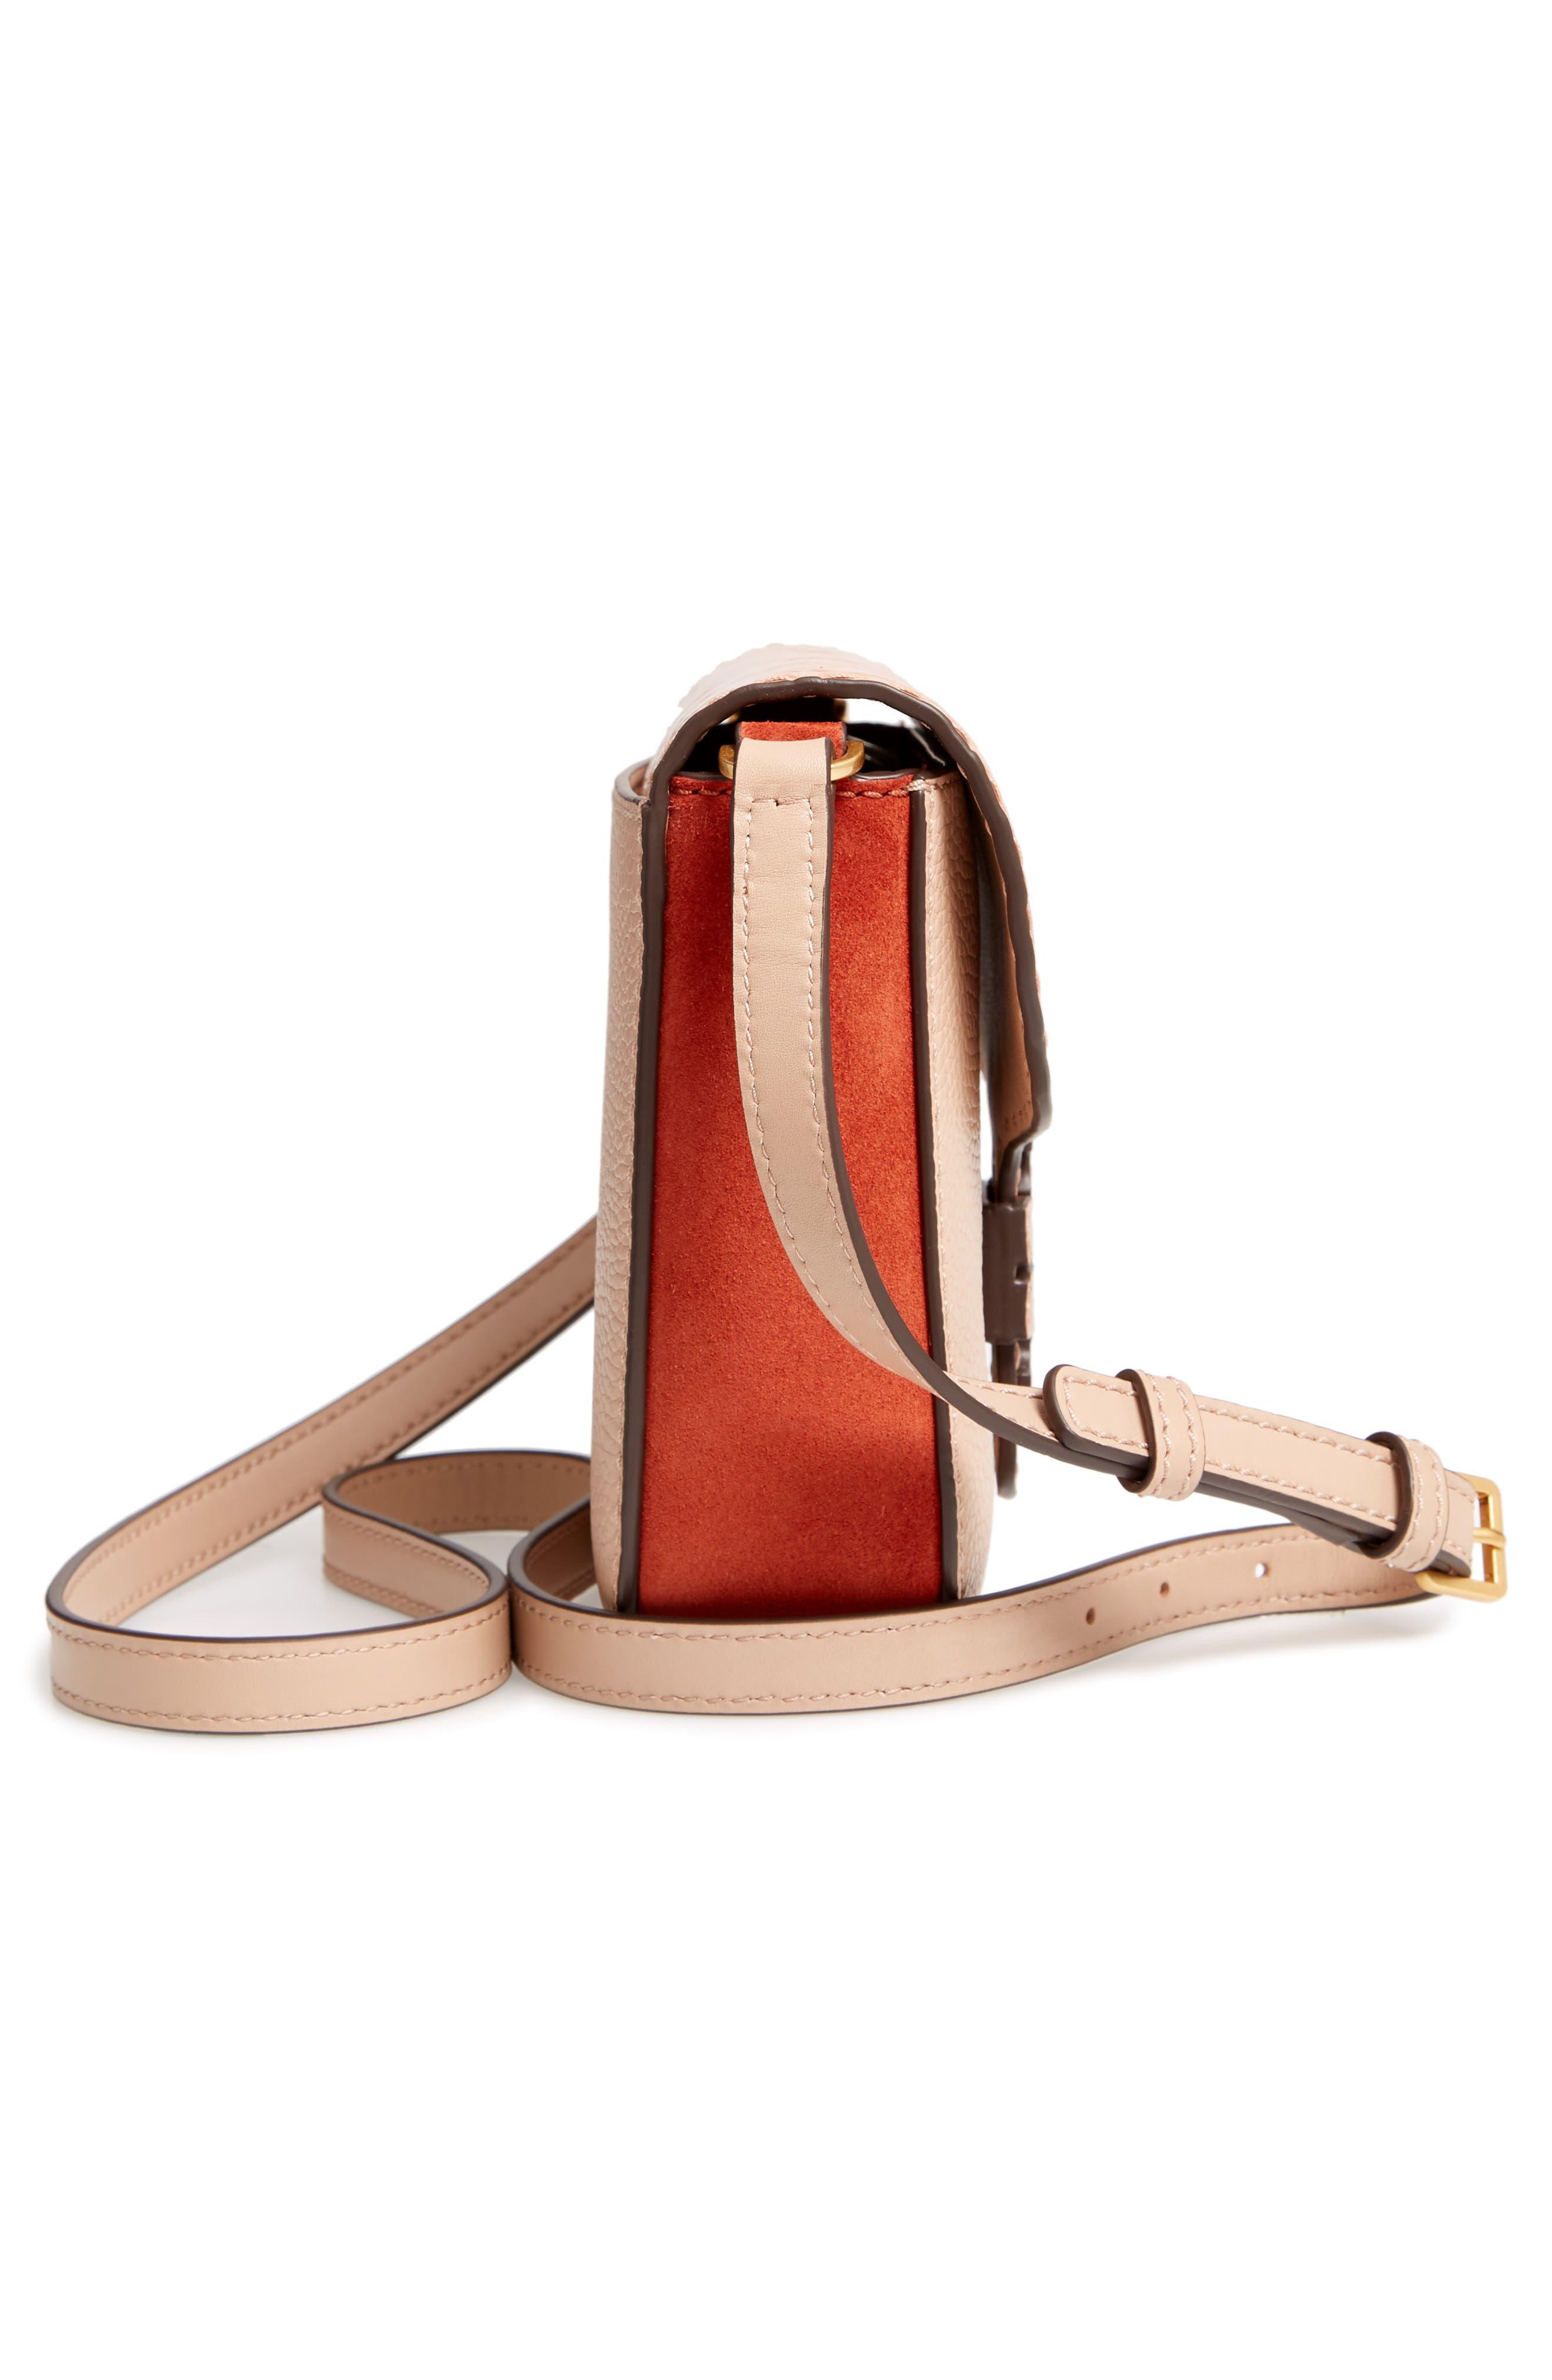 McGraw Croc Embossed Leather Crossbody Bag,                             Alternate thumbnail 5, color,                             200